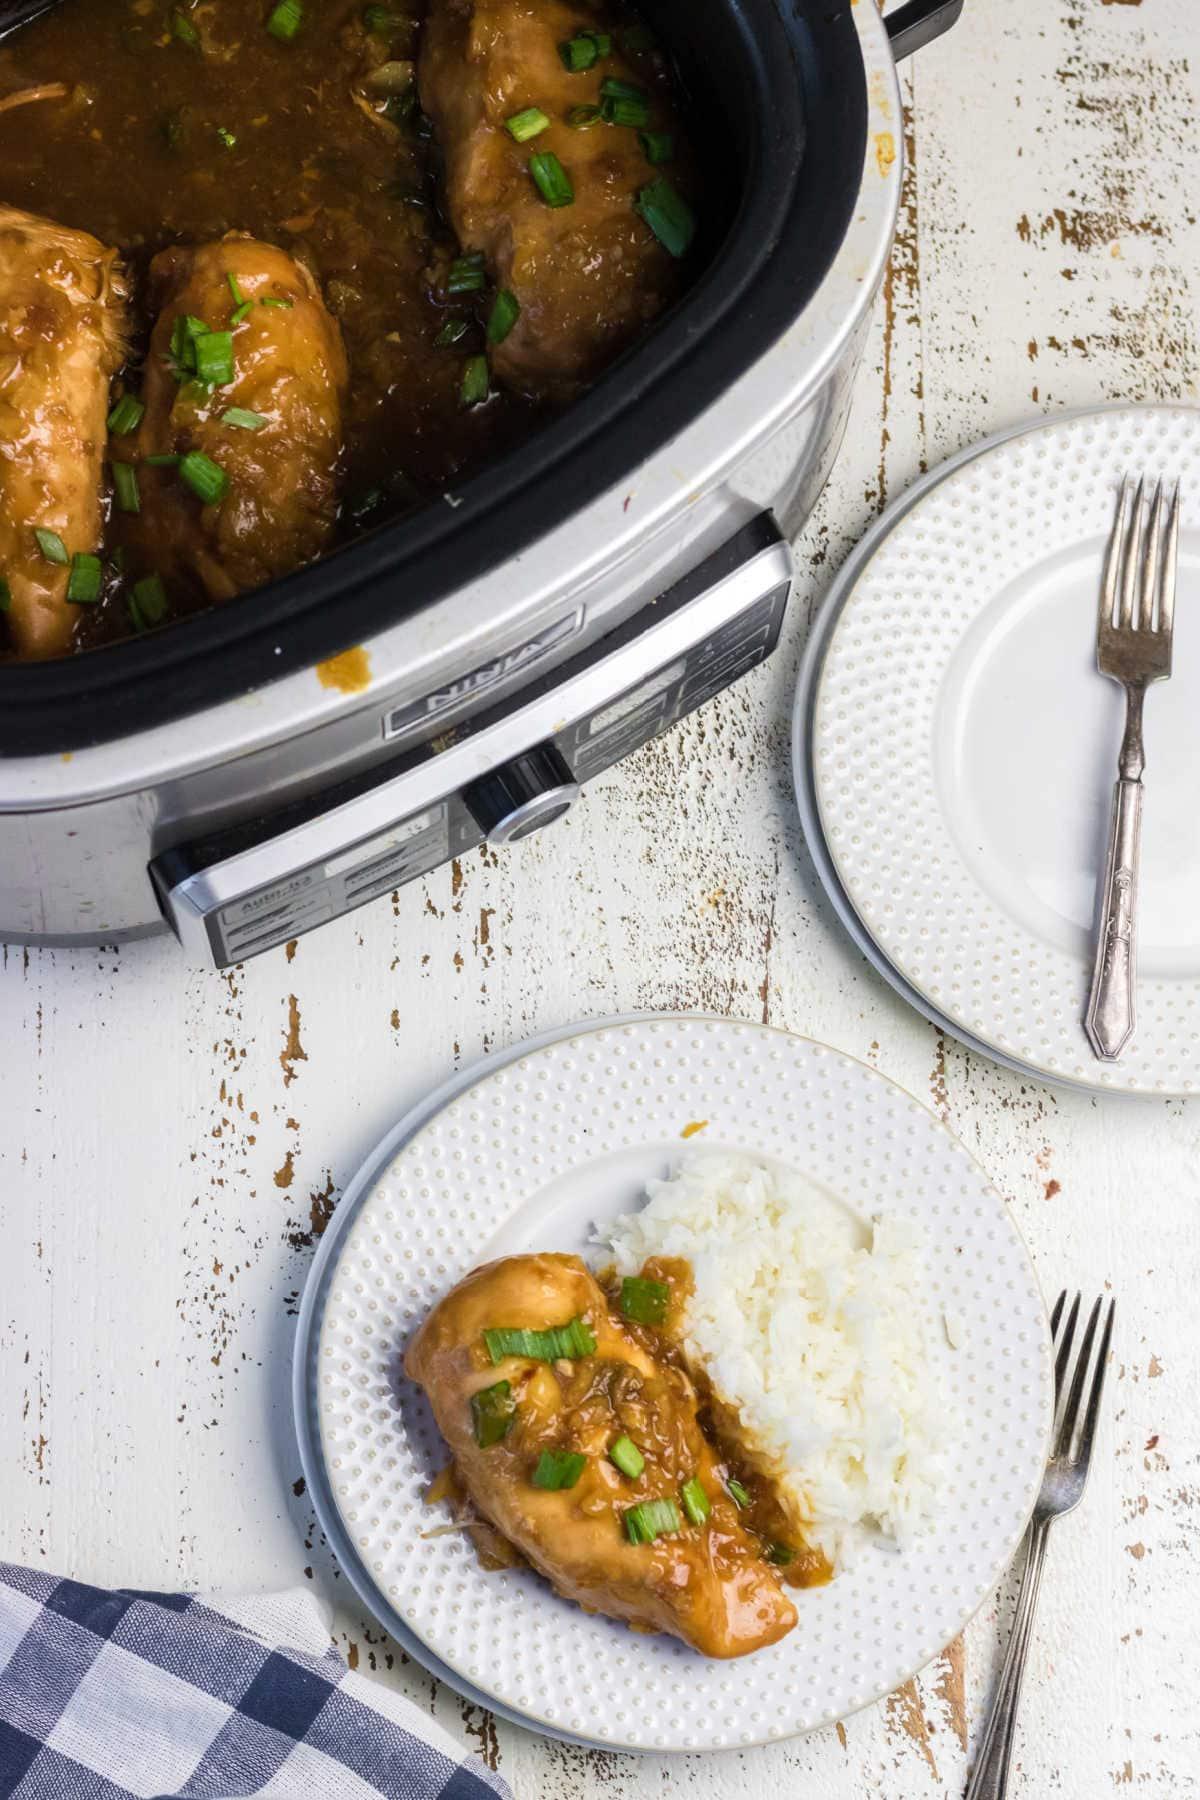 Teriyaki chicken in the slow cooker.